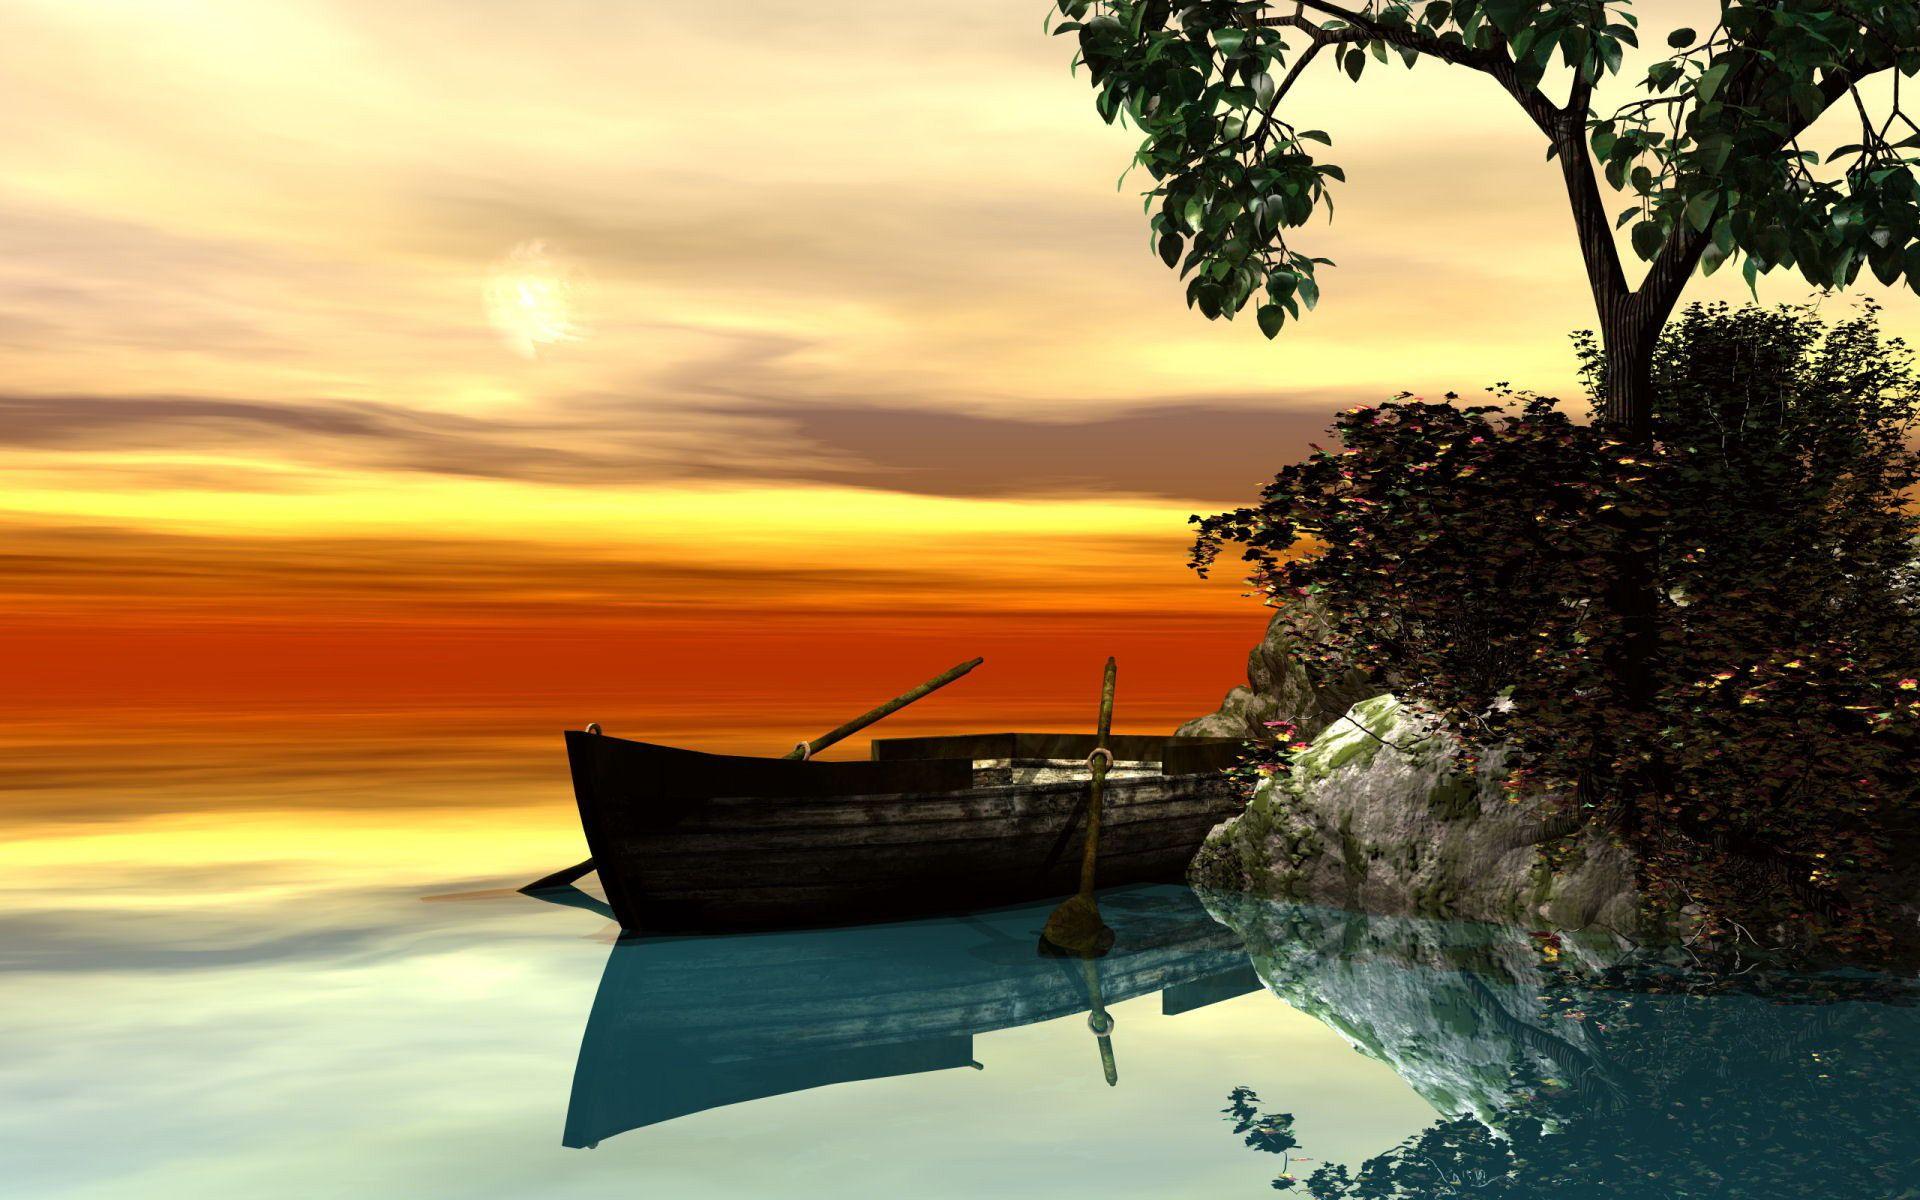 Rowboat In A Serene Scene Wallpaper Backgrounds Boat Wallpaper Background Images